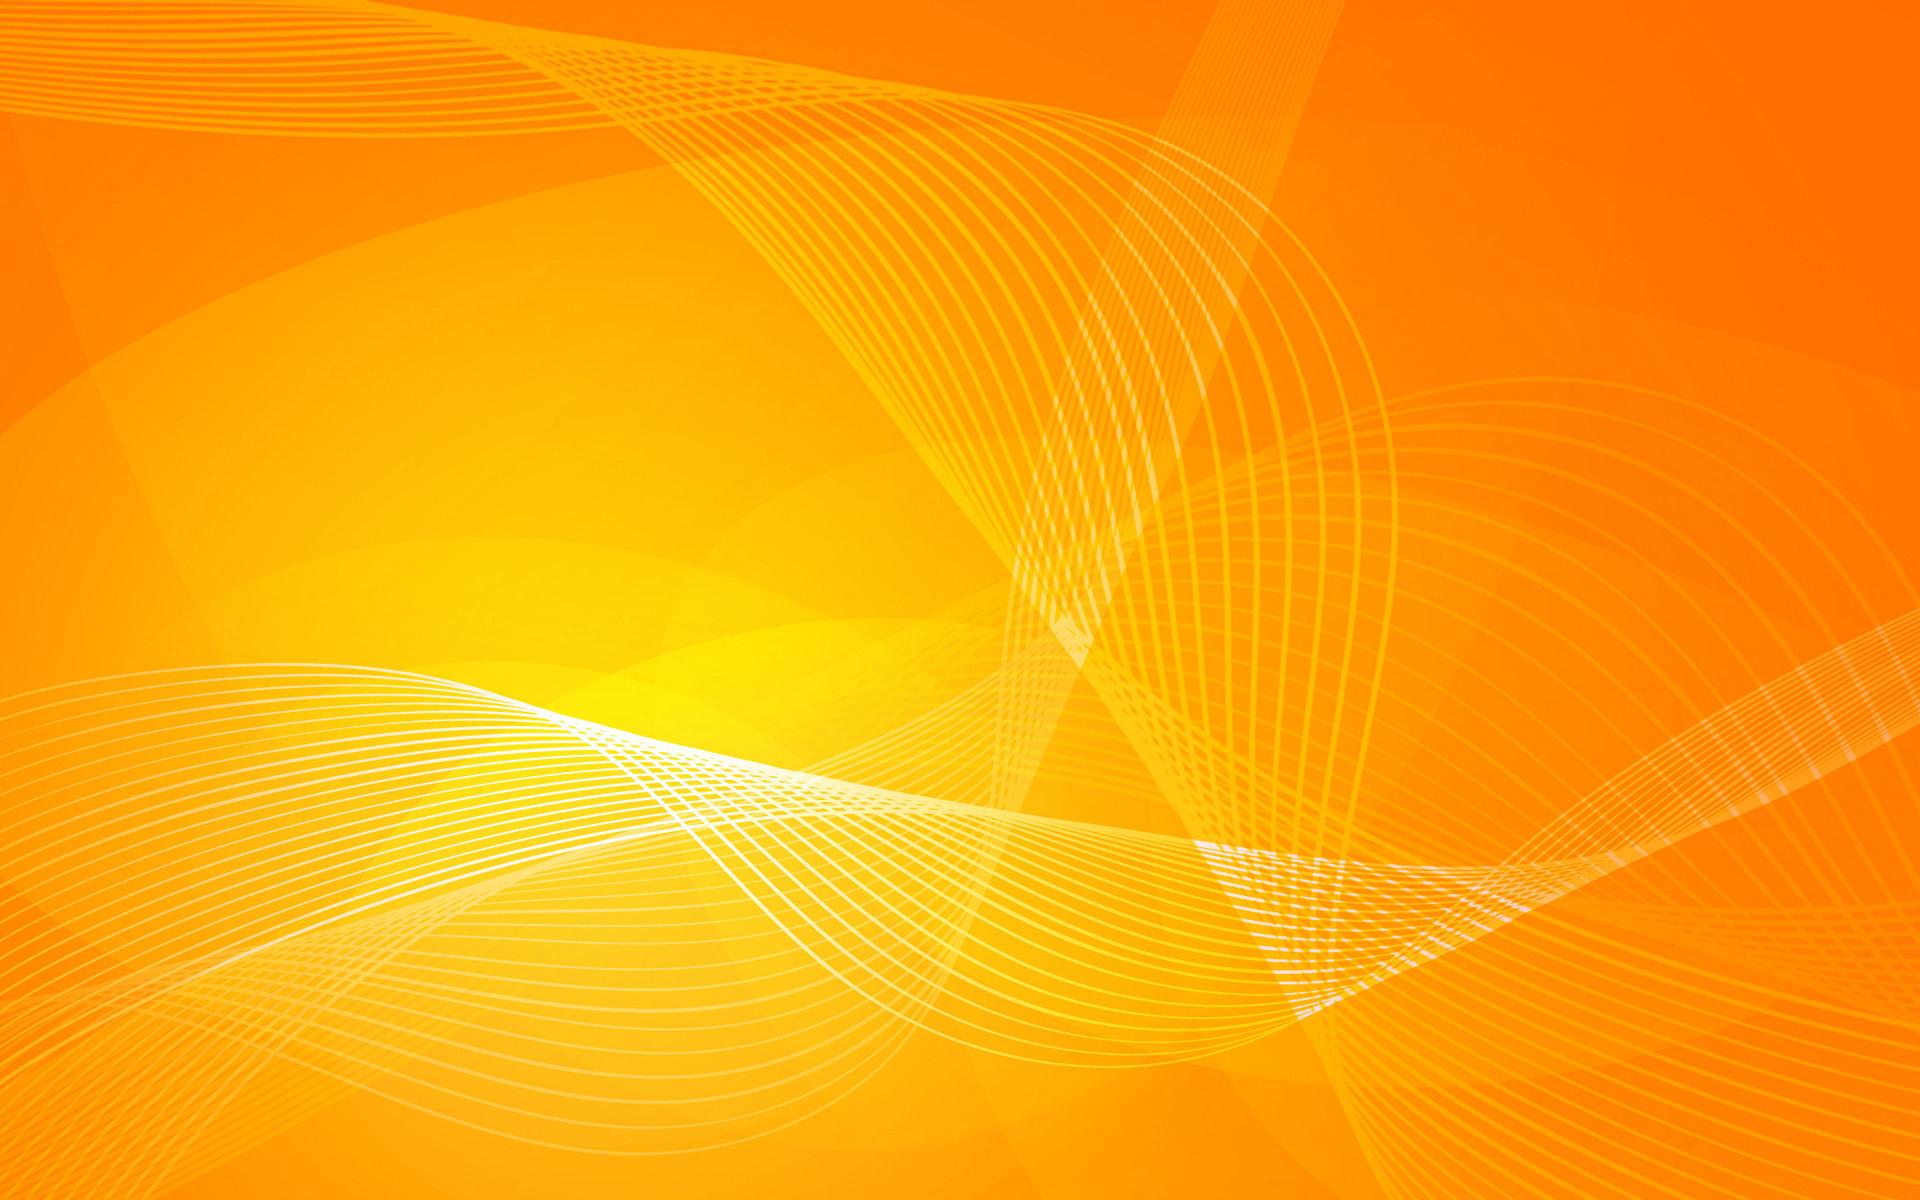 Orange Curves Wallpaper